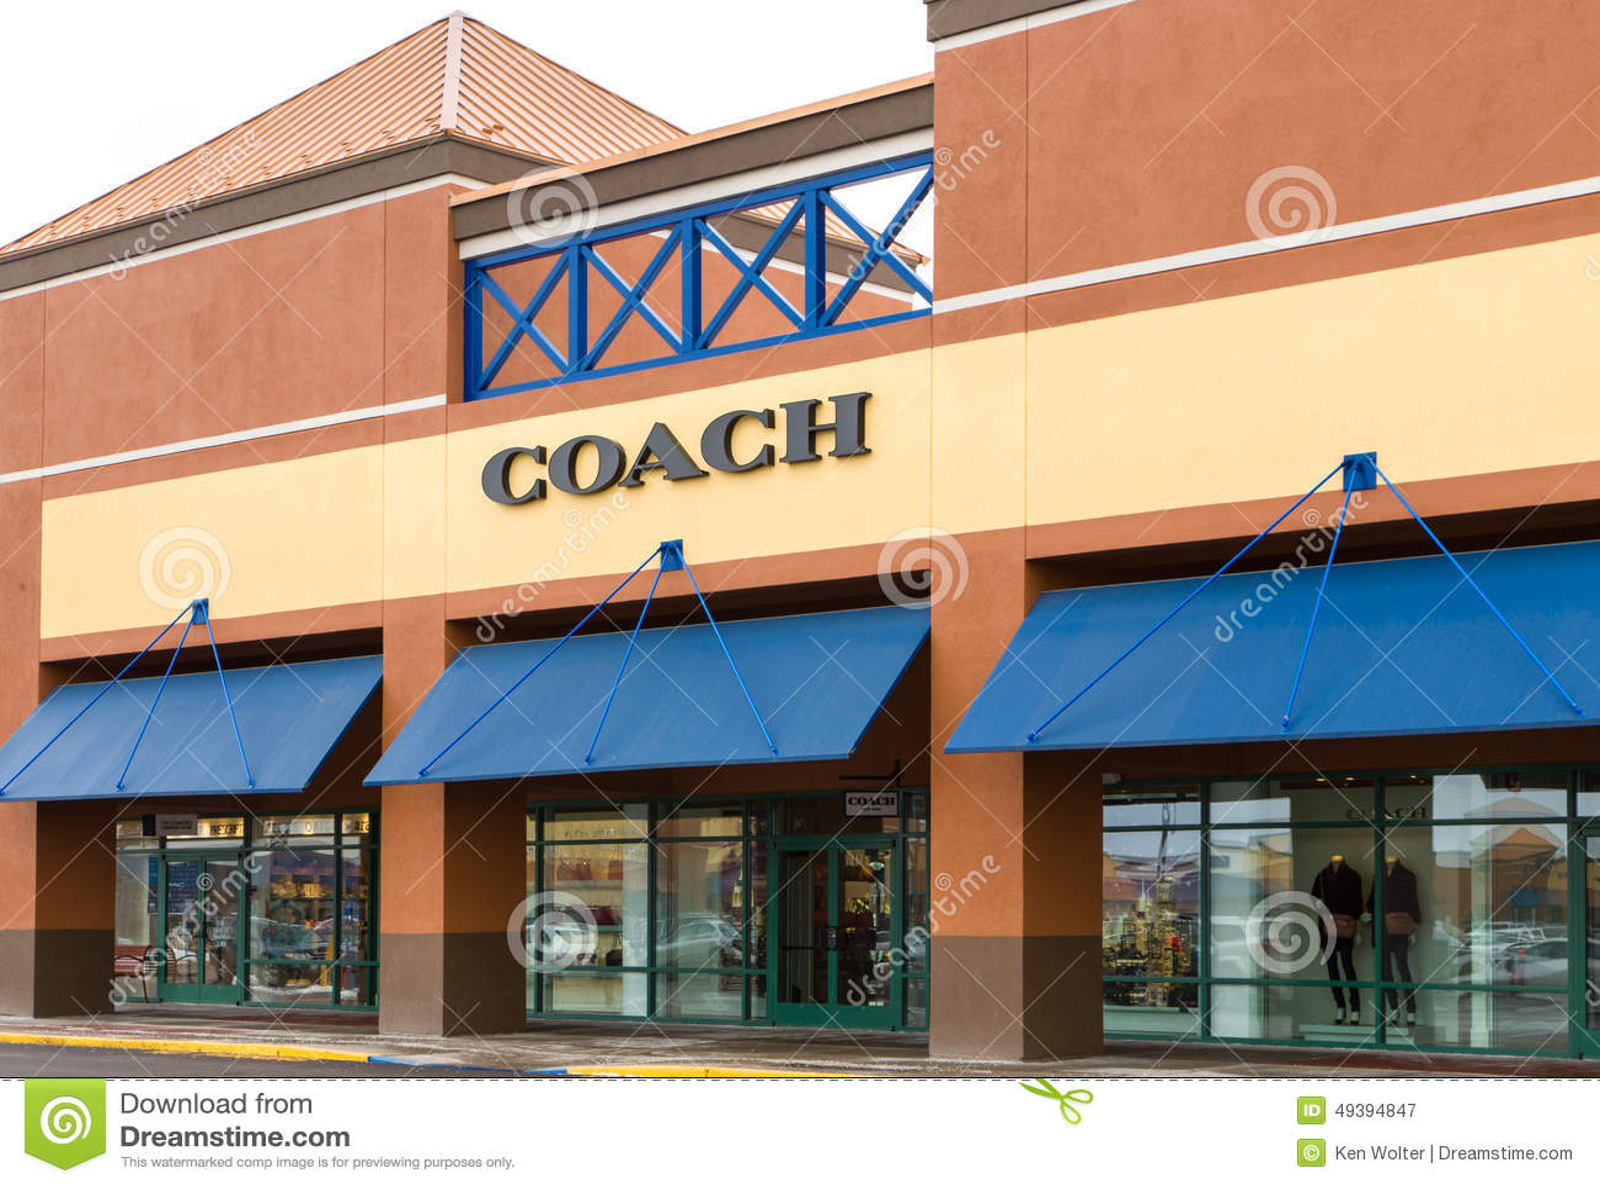 classic coach bags outlet q5ao  coach classic 570 810 sports zone coach classic 50s 90s rap playlistcoach  classic 60s inspiredcoach classic 442 8175 oldcoach classic 442 motorsports